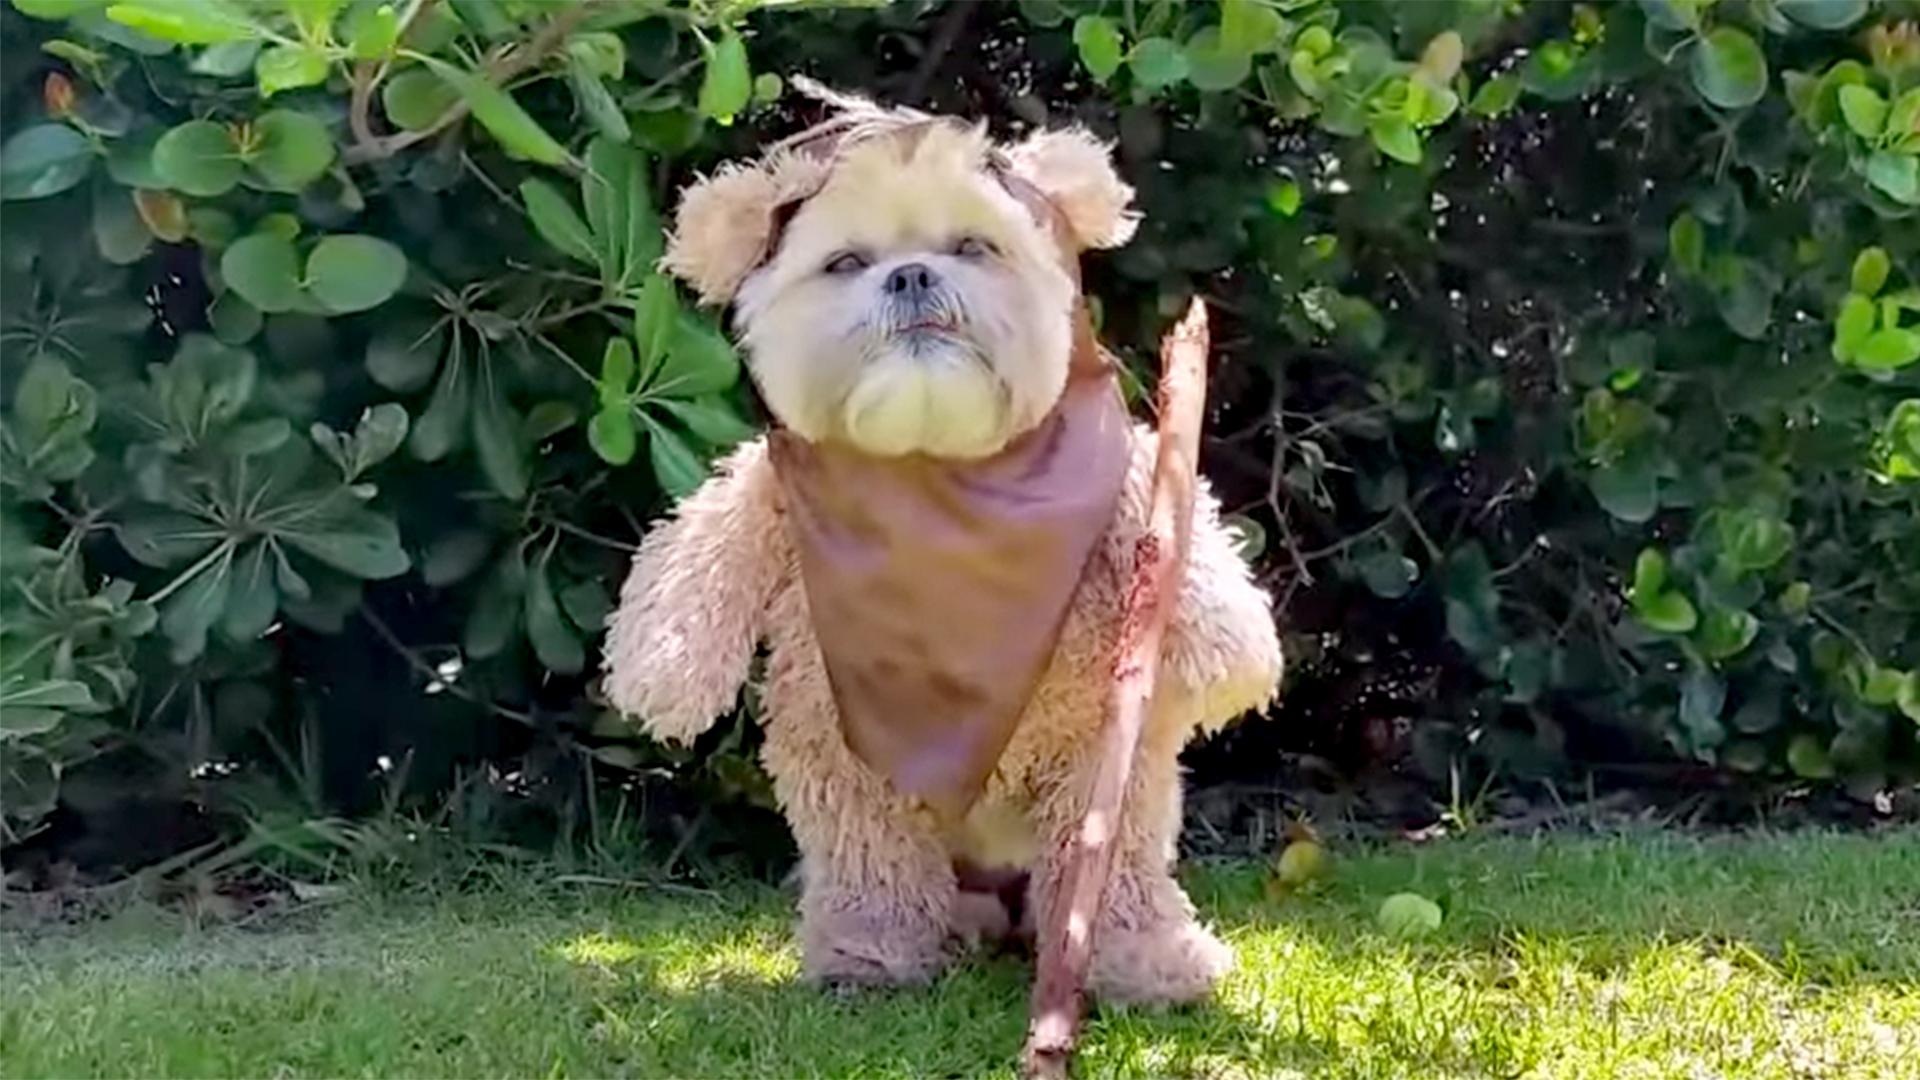 Gorgeous Munchkin Ewok Impression Is A Star Munchkin Ewok Impression Is A Star Wars Dog Leash Star Wars Dogfight bark post Star Wars Dog